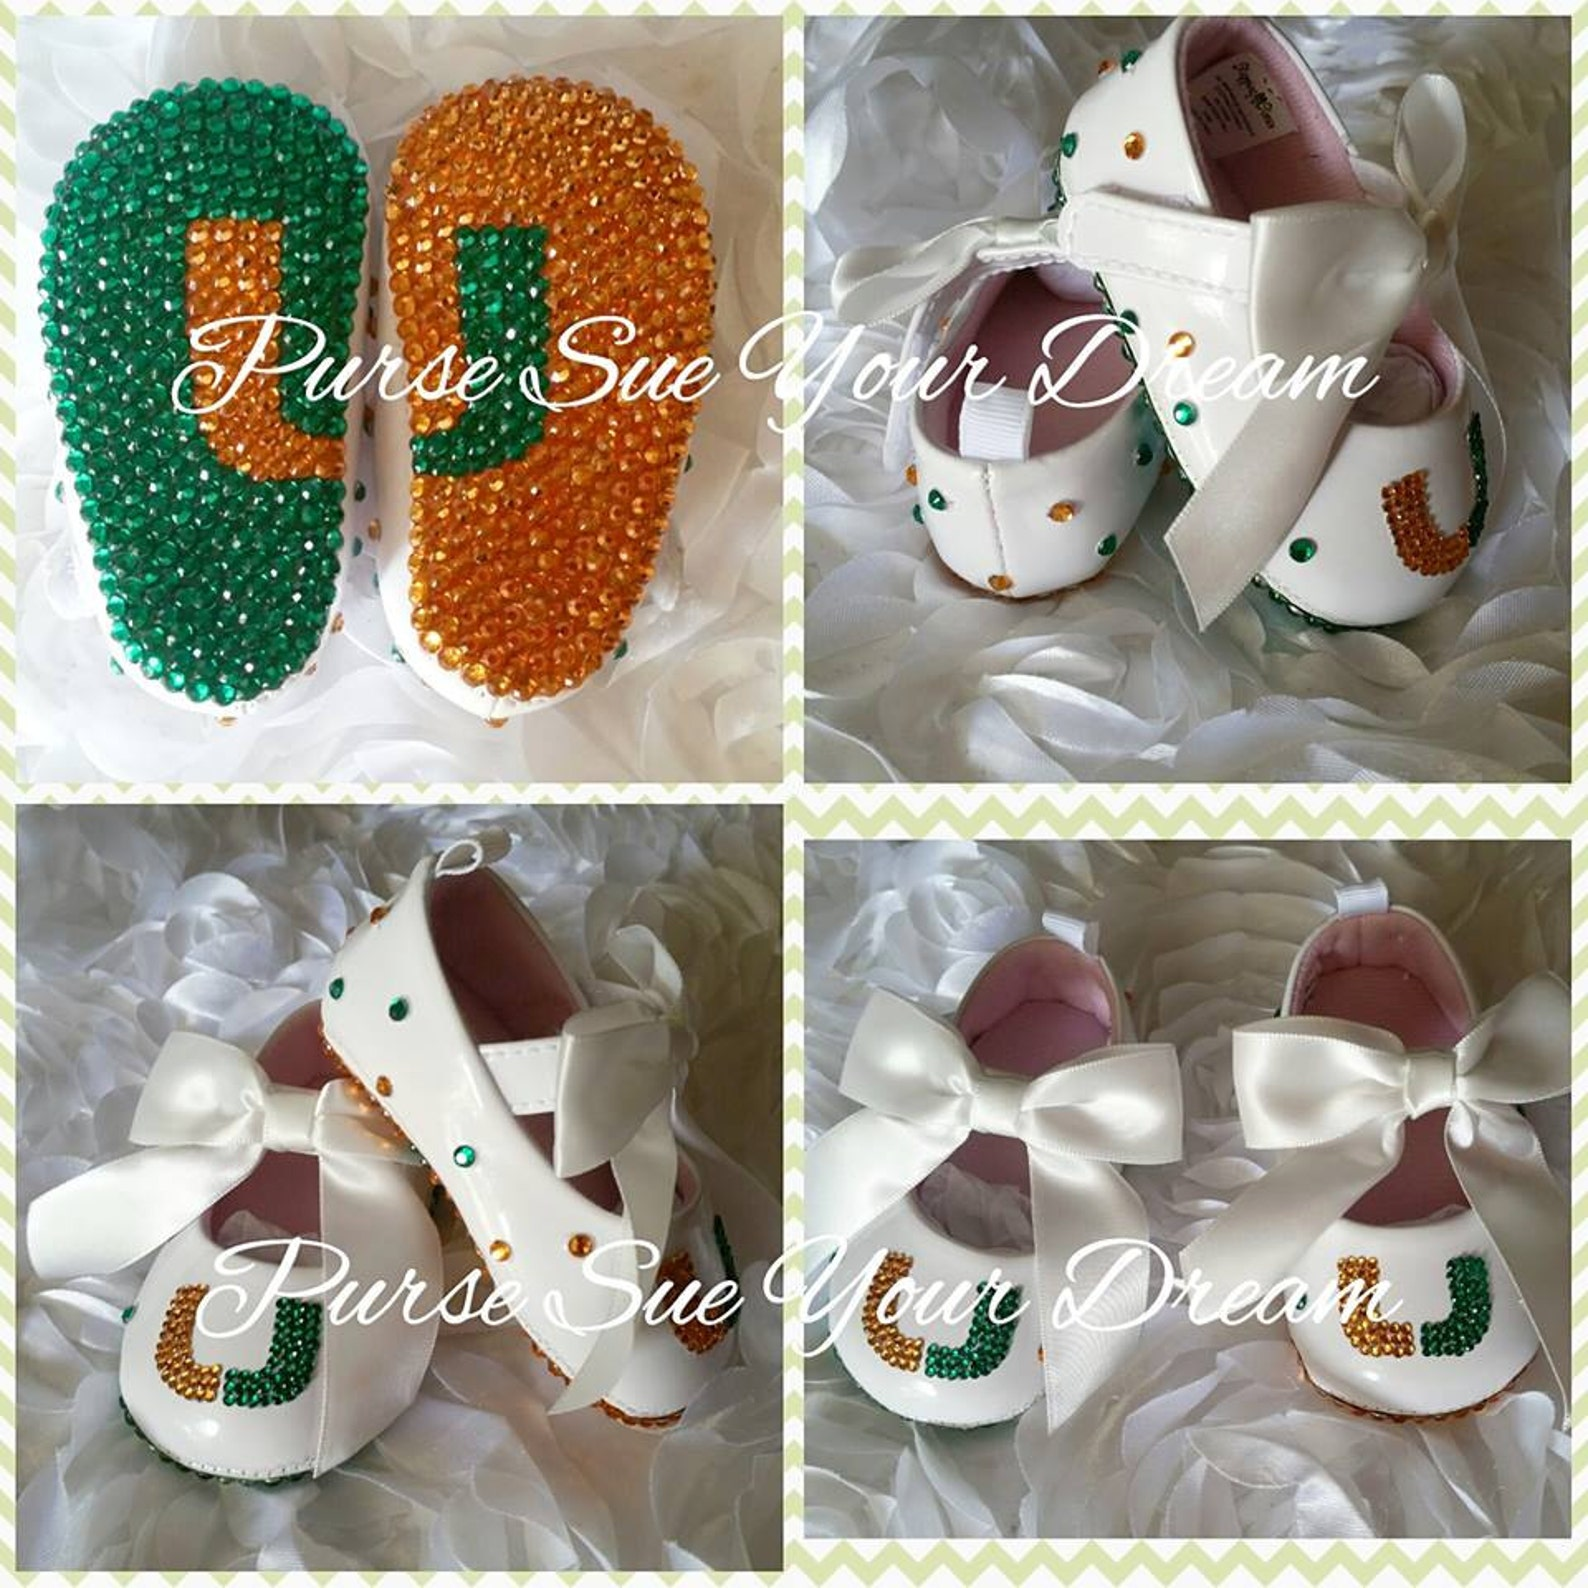 miami hurricane inspired crystal rhinestone infant size ballet shoes - swarovski baby shoes - christening/baptism/pageant/weddin